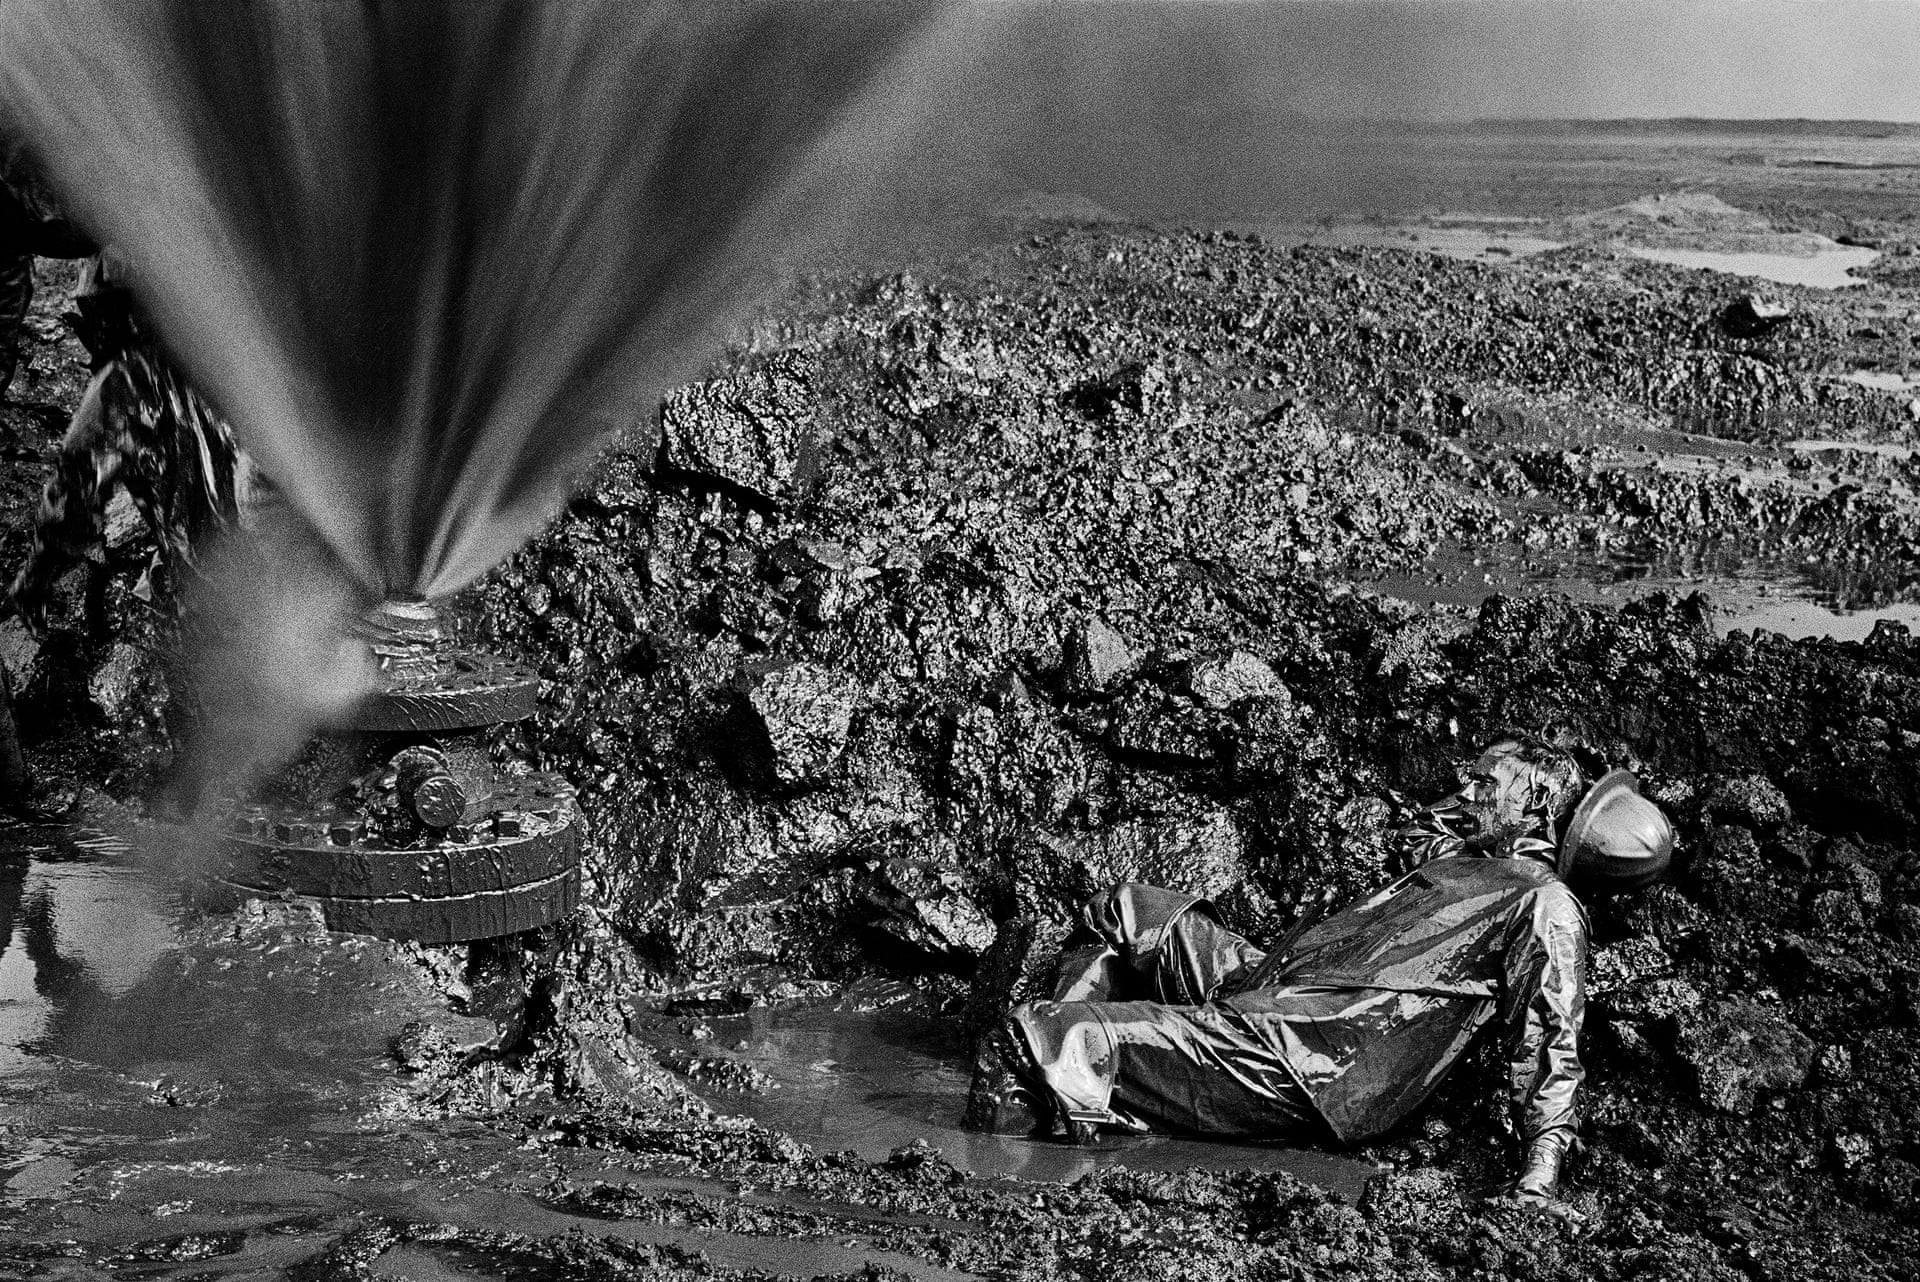 Нефть, Кувейт, 1991. Автор Себастьян Сальгадо